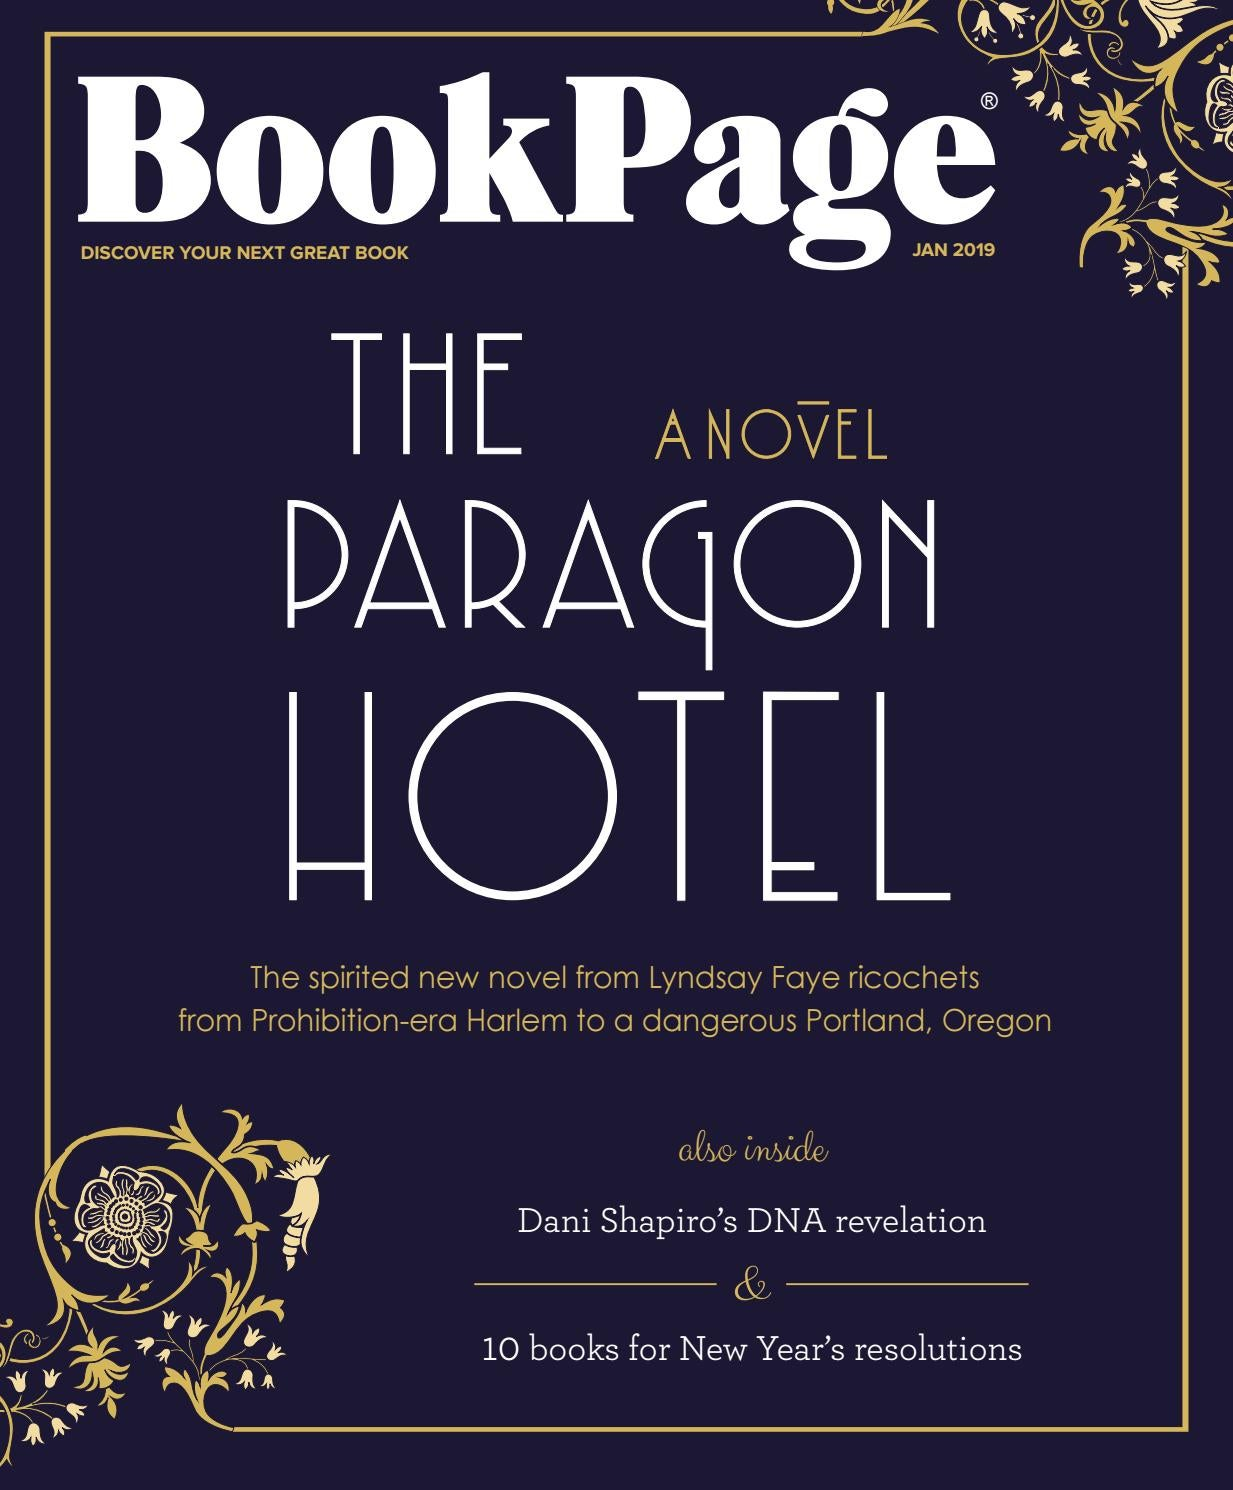 bookpage january 2019